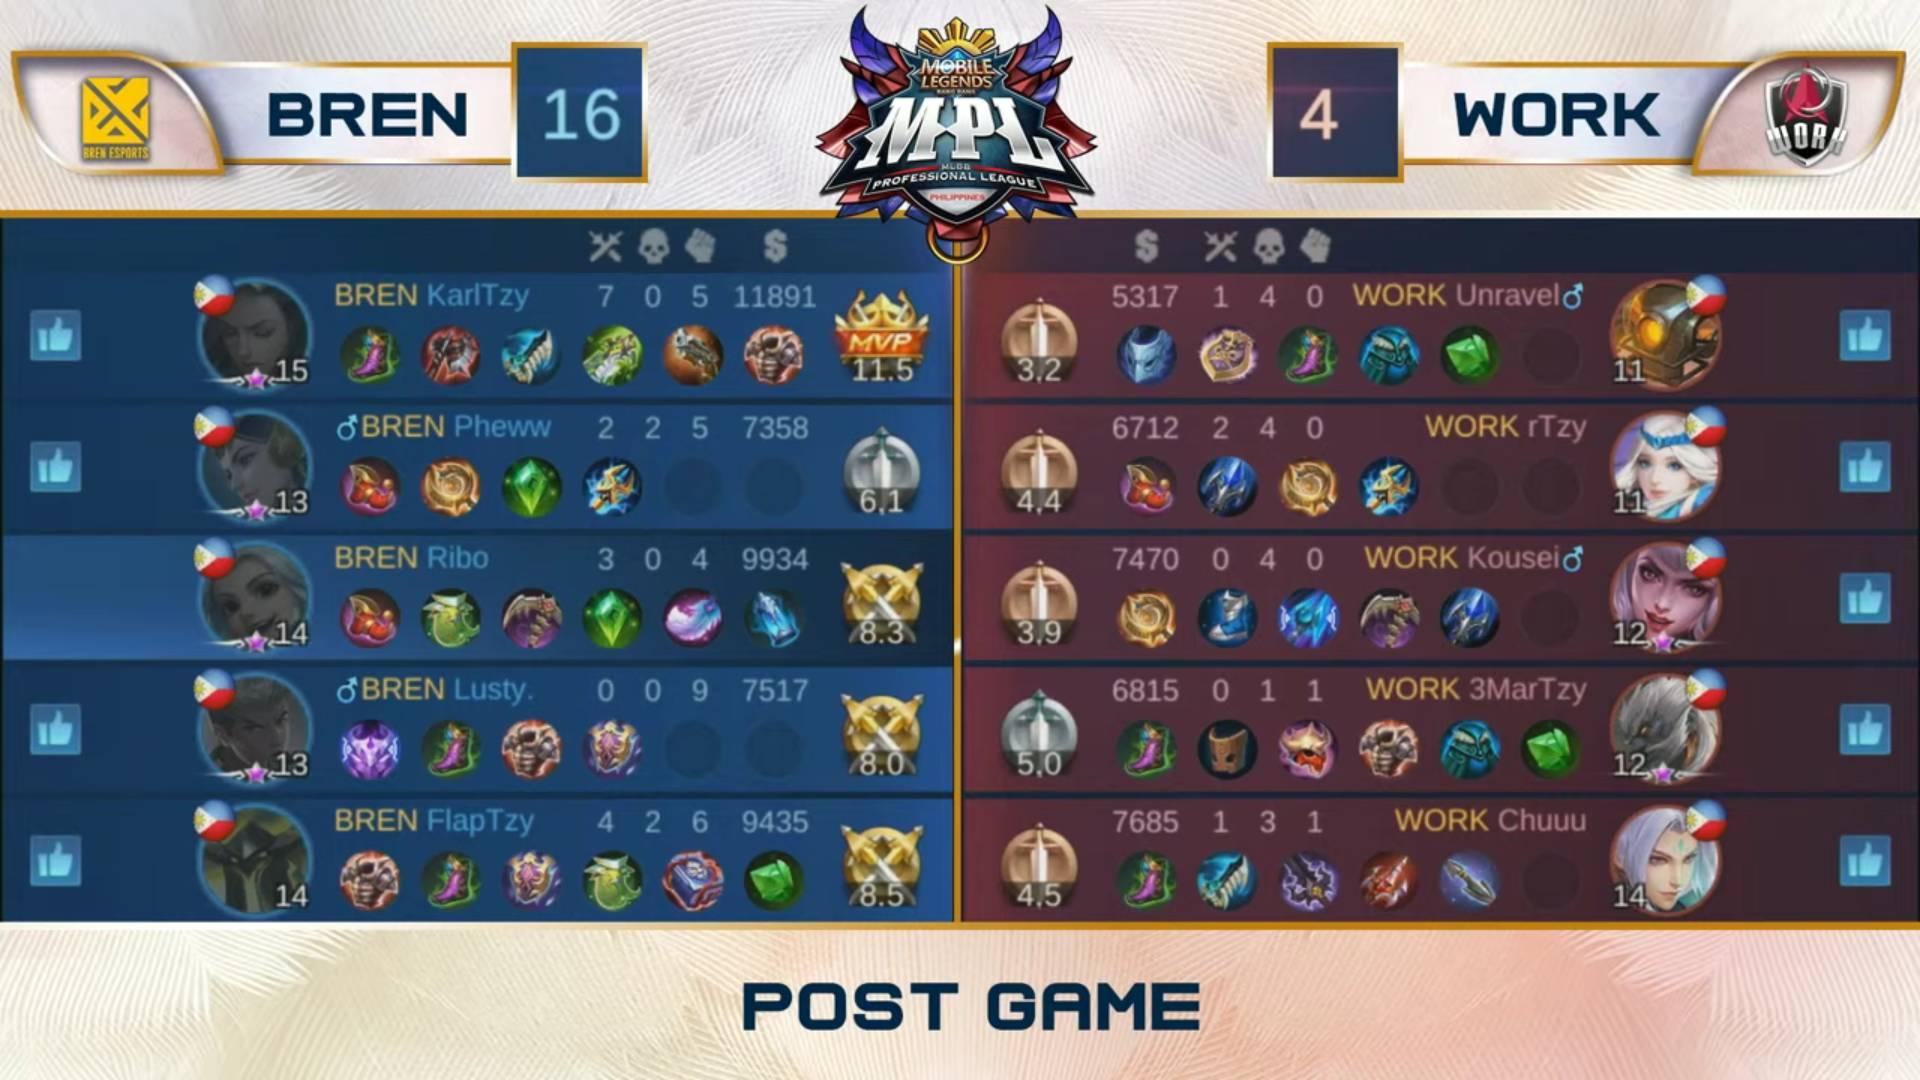 MPL-PH-Season-7-lower-bracket-BREN-def-Work-Auster-Game-3 KarlTzy's monster Benedetta outing powers Bren past Work Auster in MPL PH playoffs ESports Mobile Legends MPL-PH News  - philippine sports news